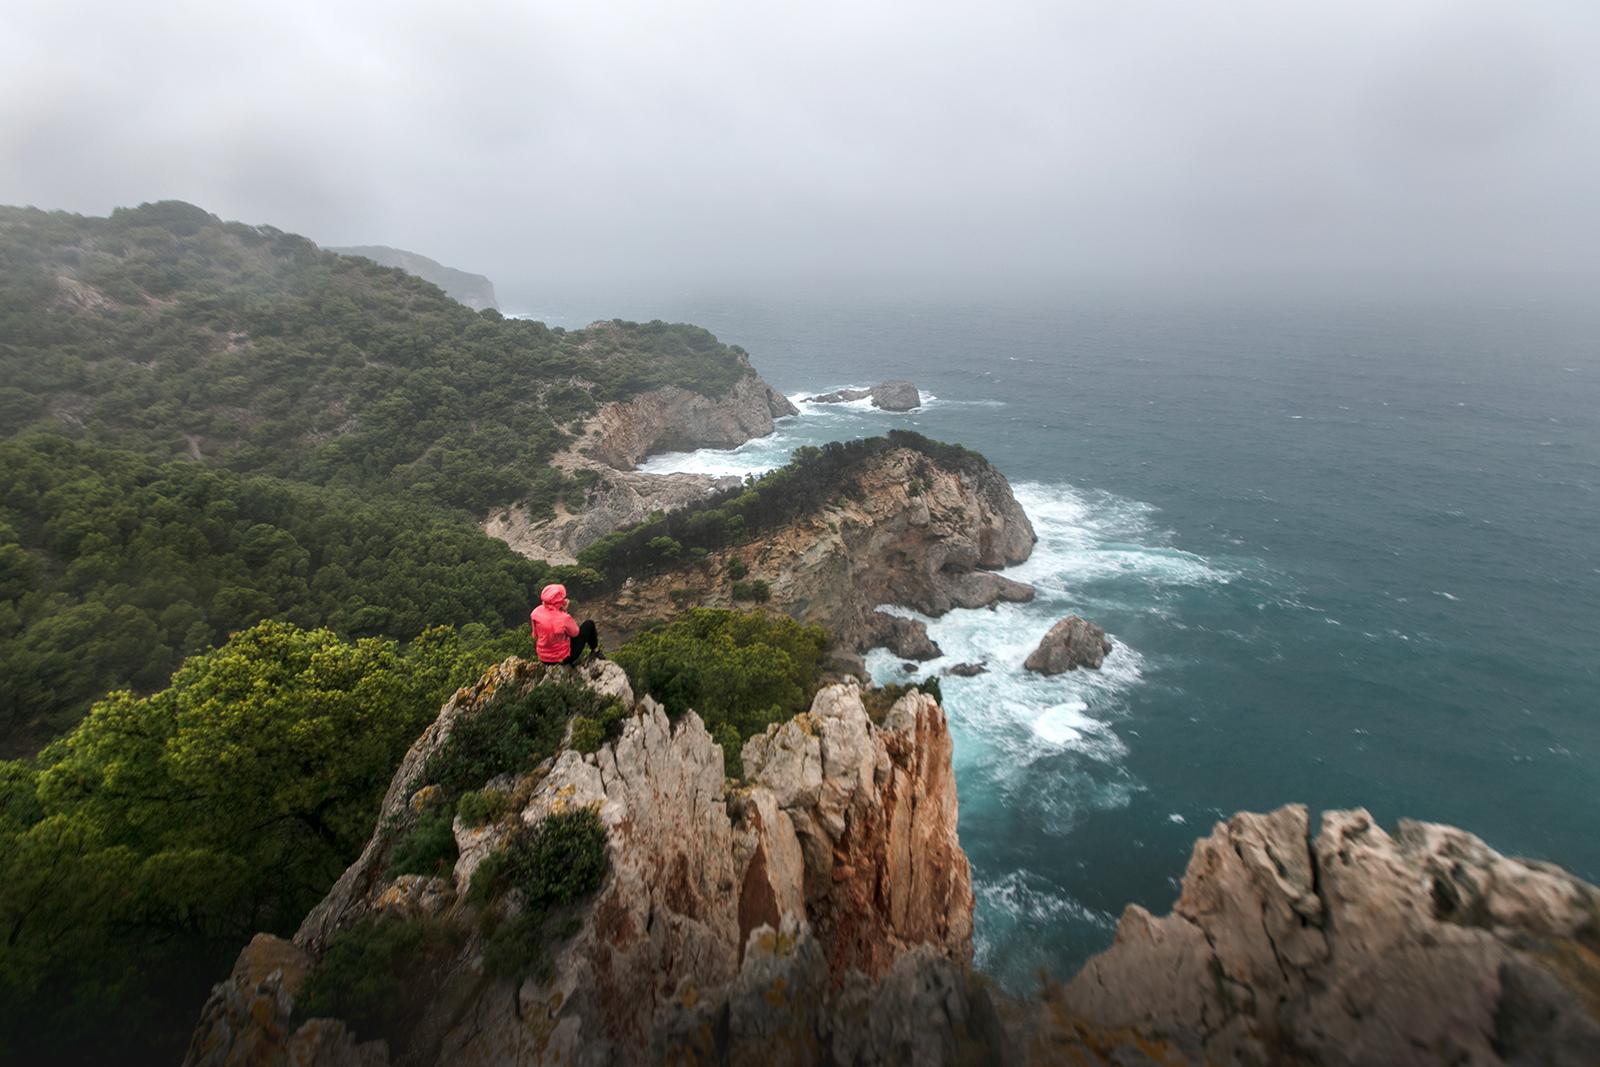 Beau paysage de la costa brava en Espagne